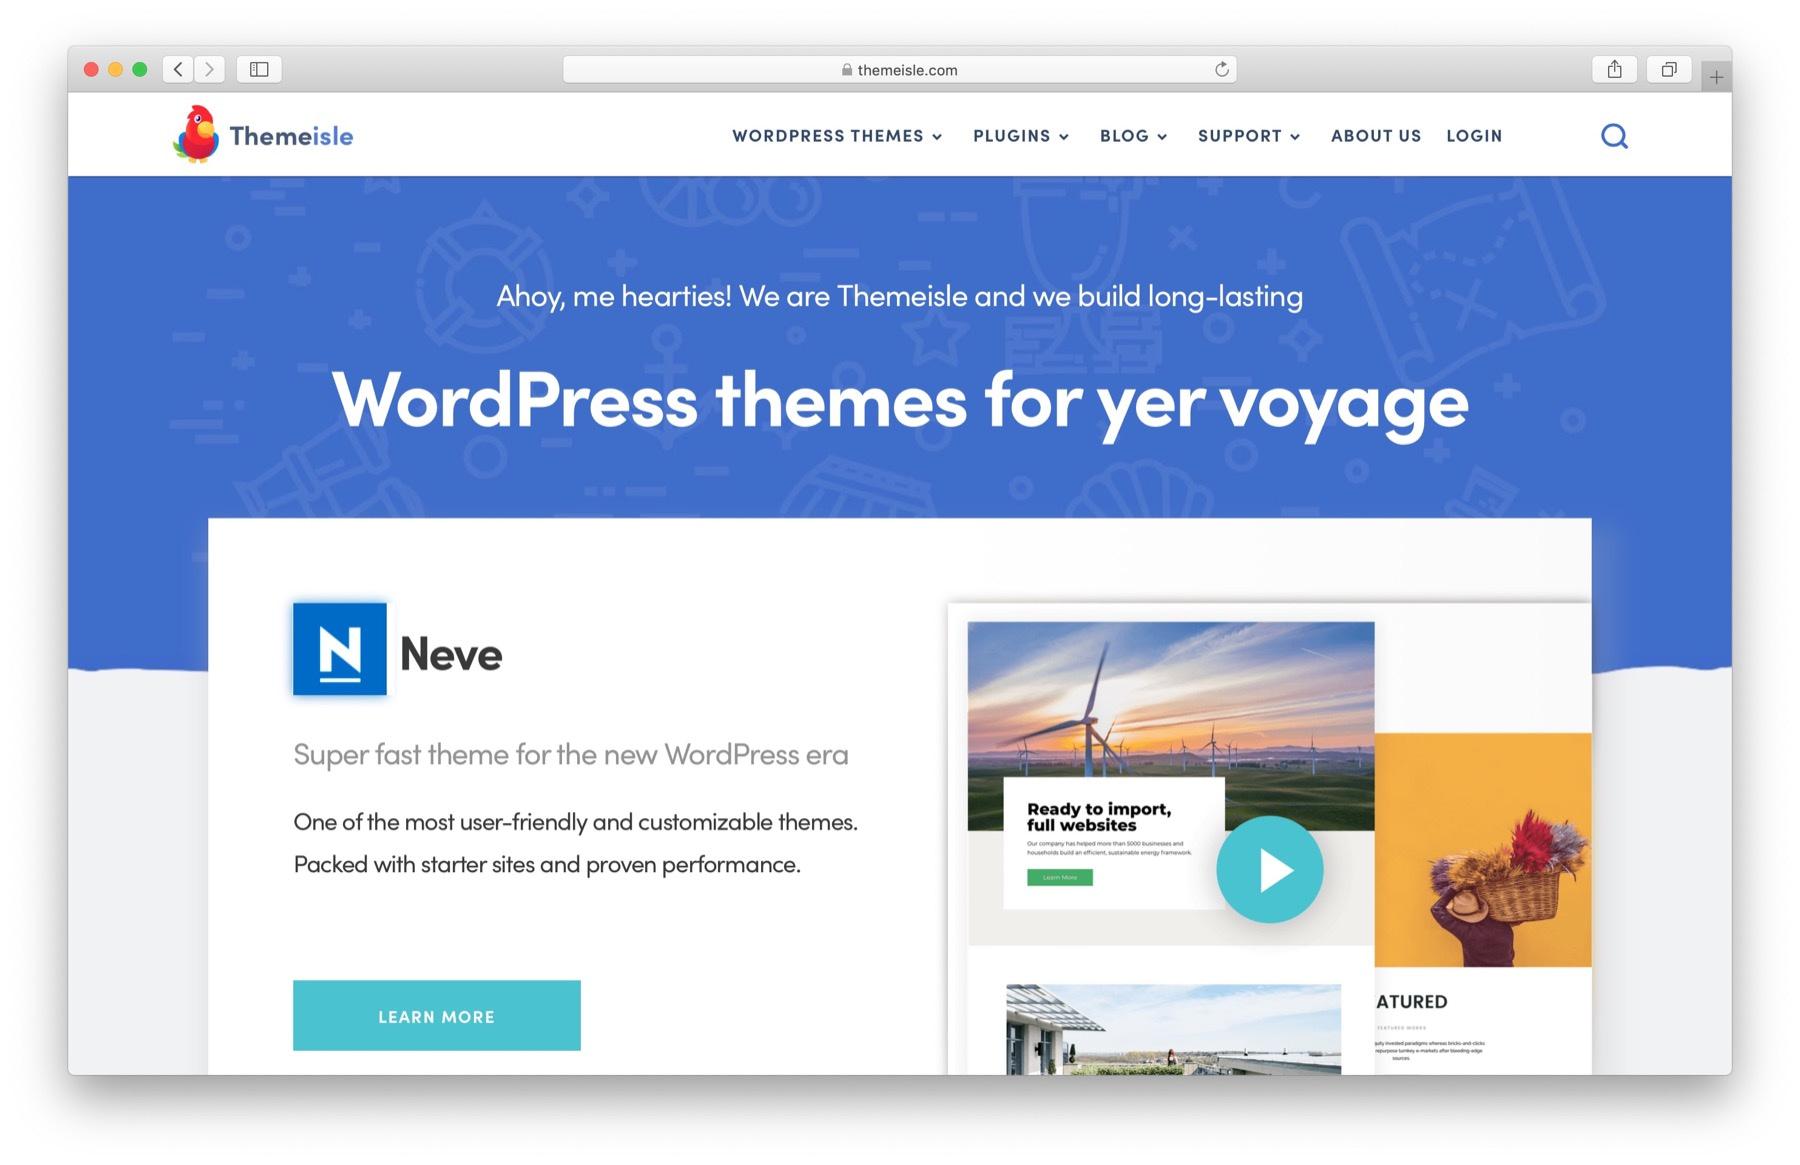 WordPress Black Friday 2019: ThemeIsle